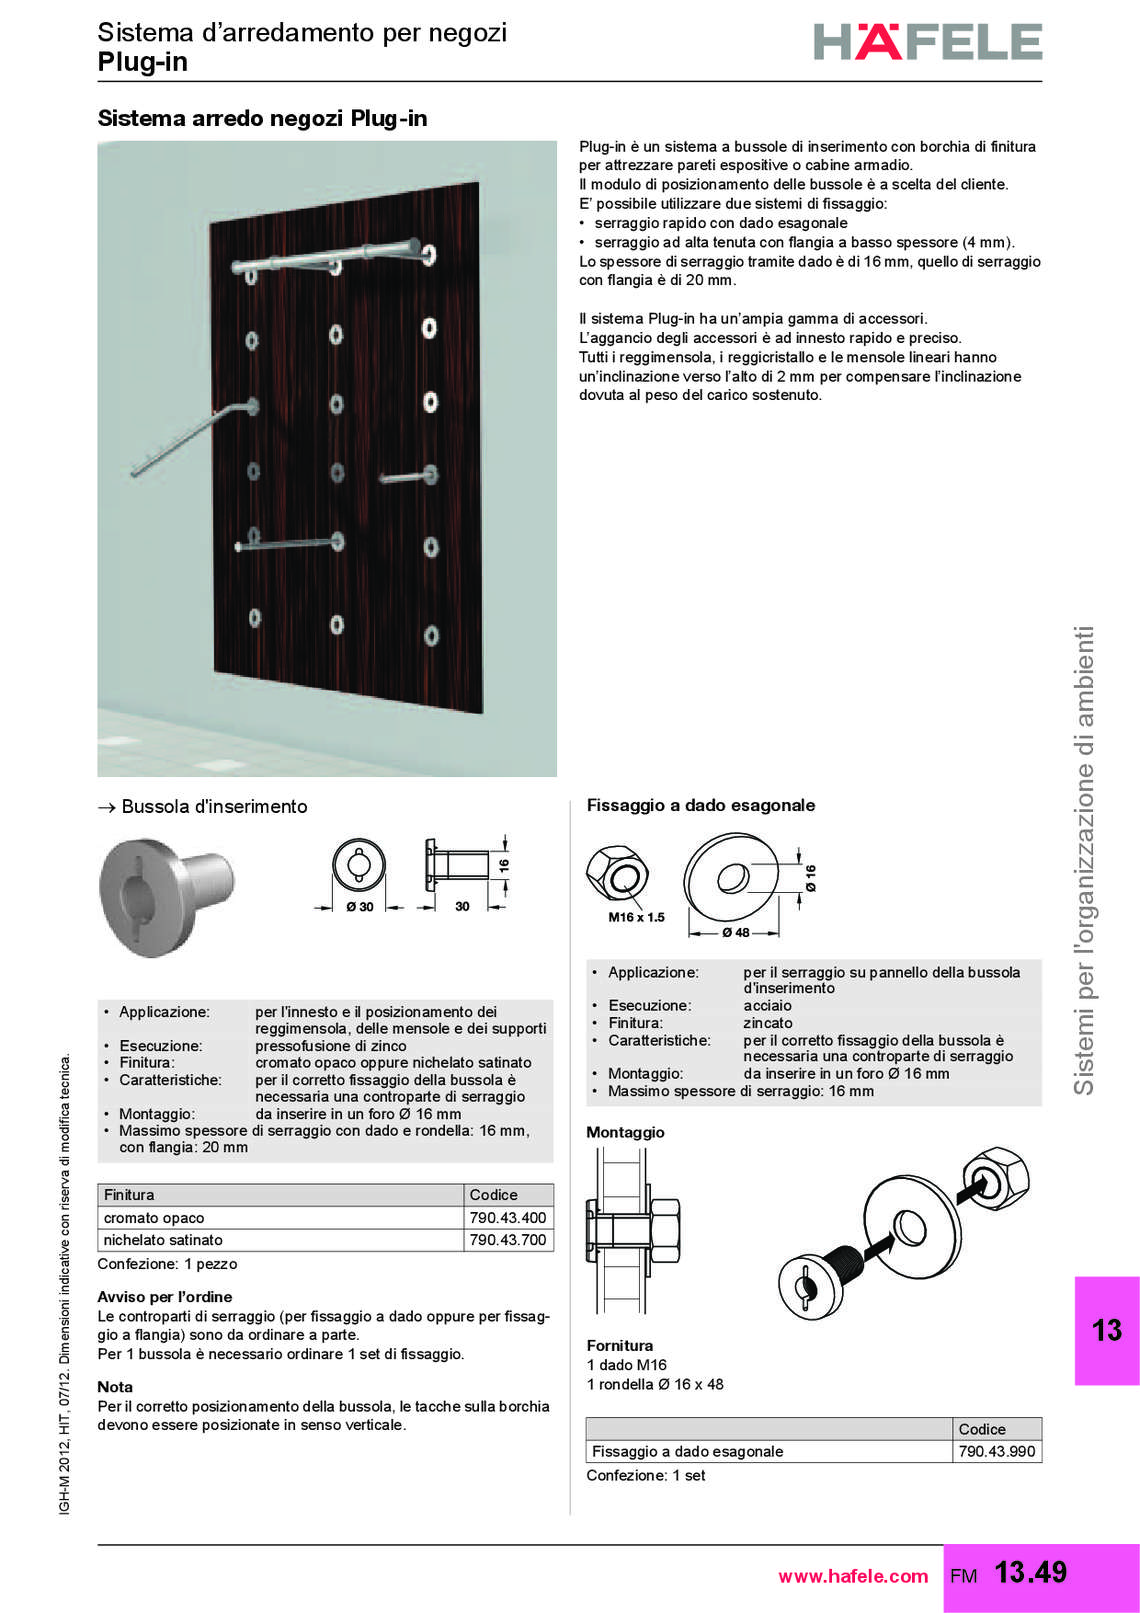 hafele-arredo-negozi-e-farmacie_32_060.jpg